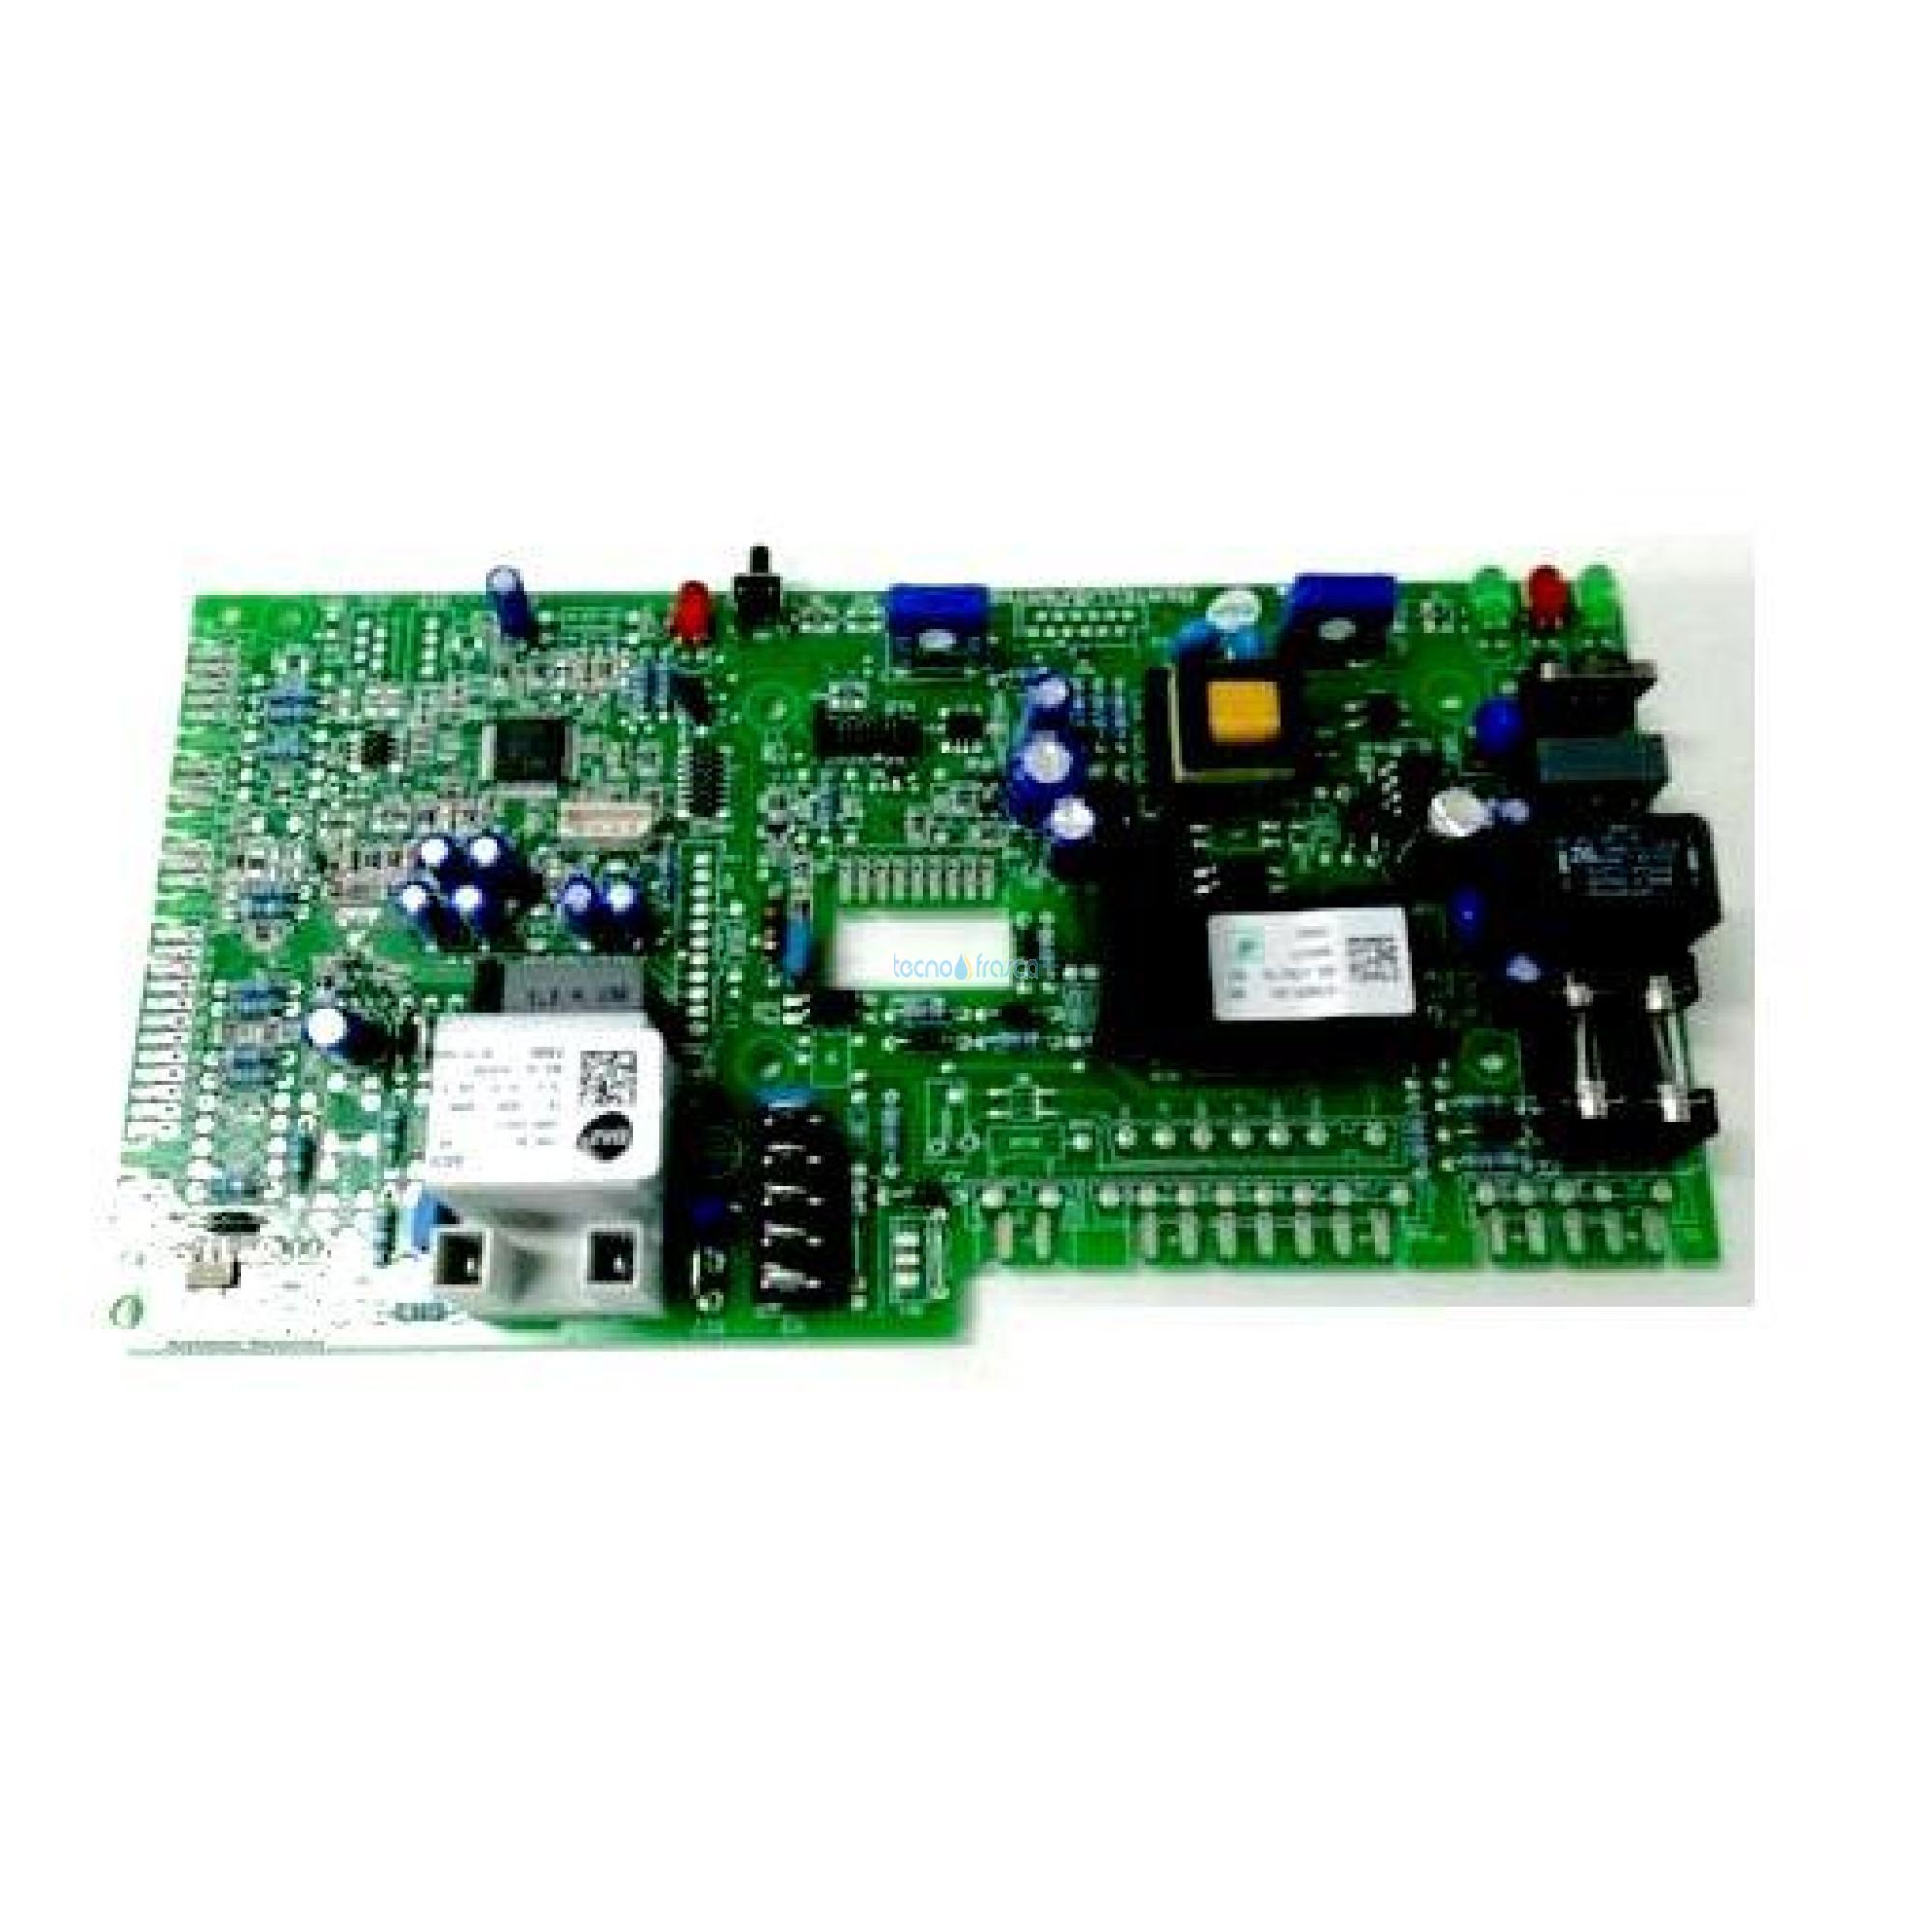 Savio biasi kit scheda integrata b&p m290l con lcd bi2015117